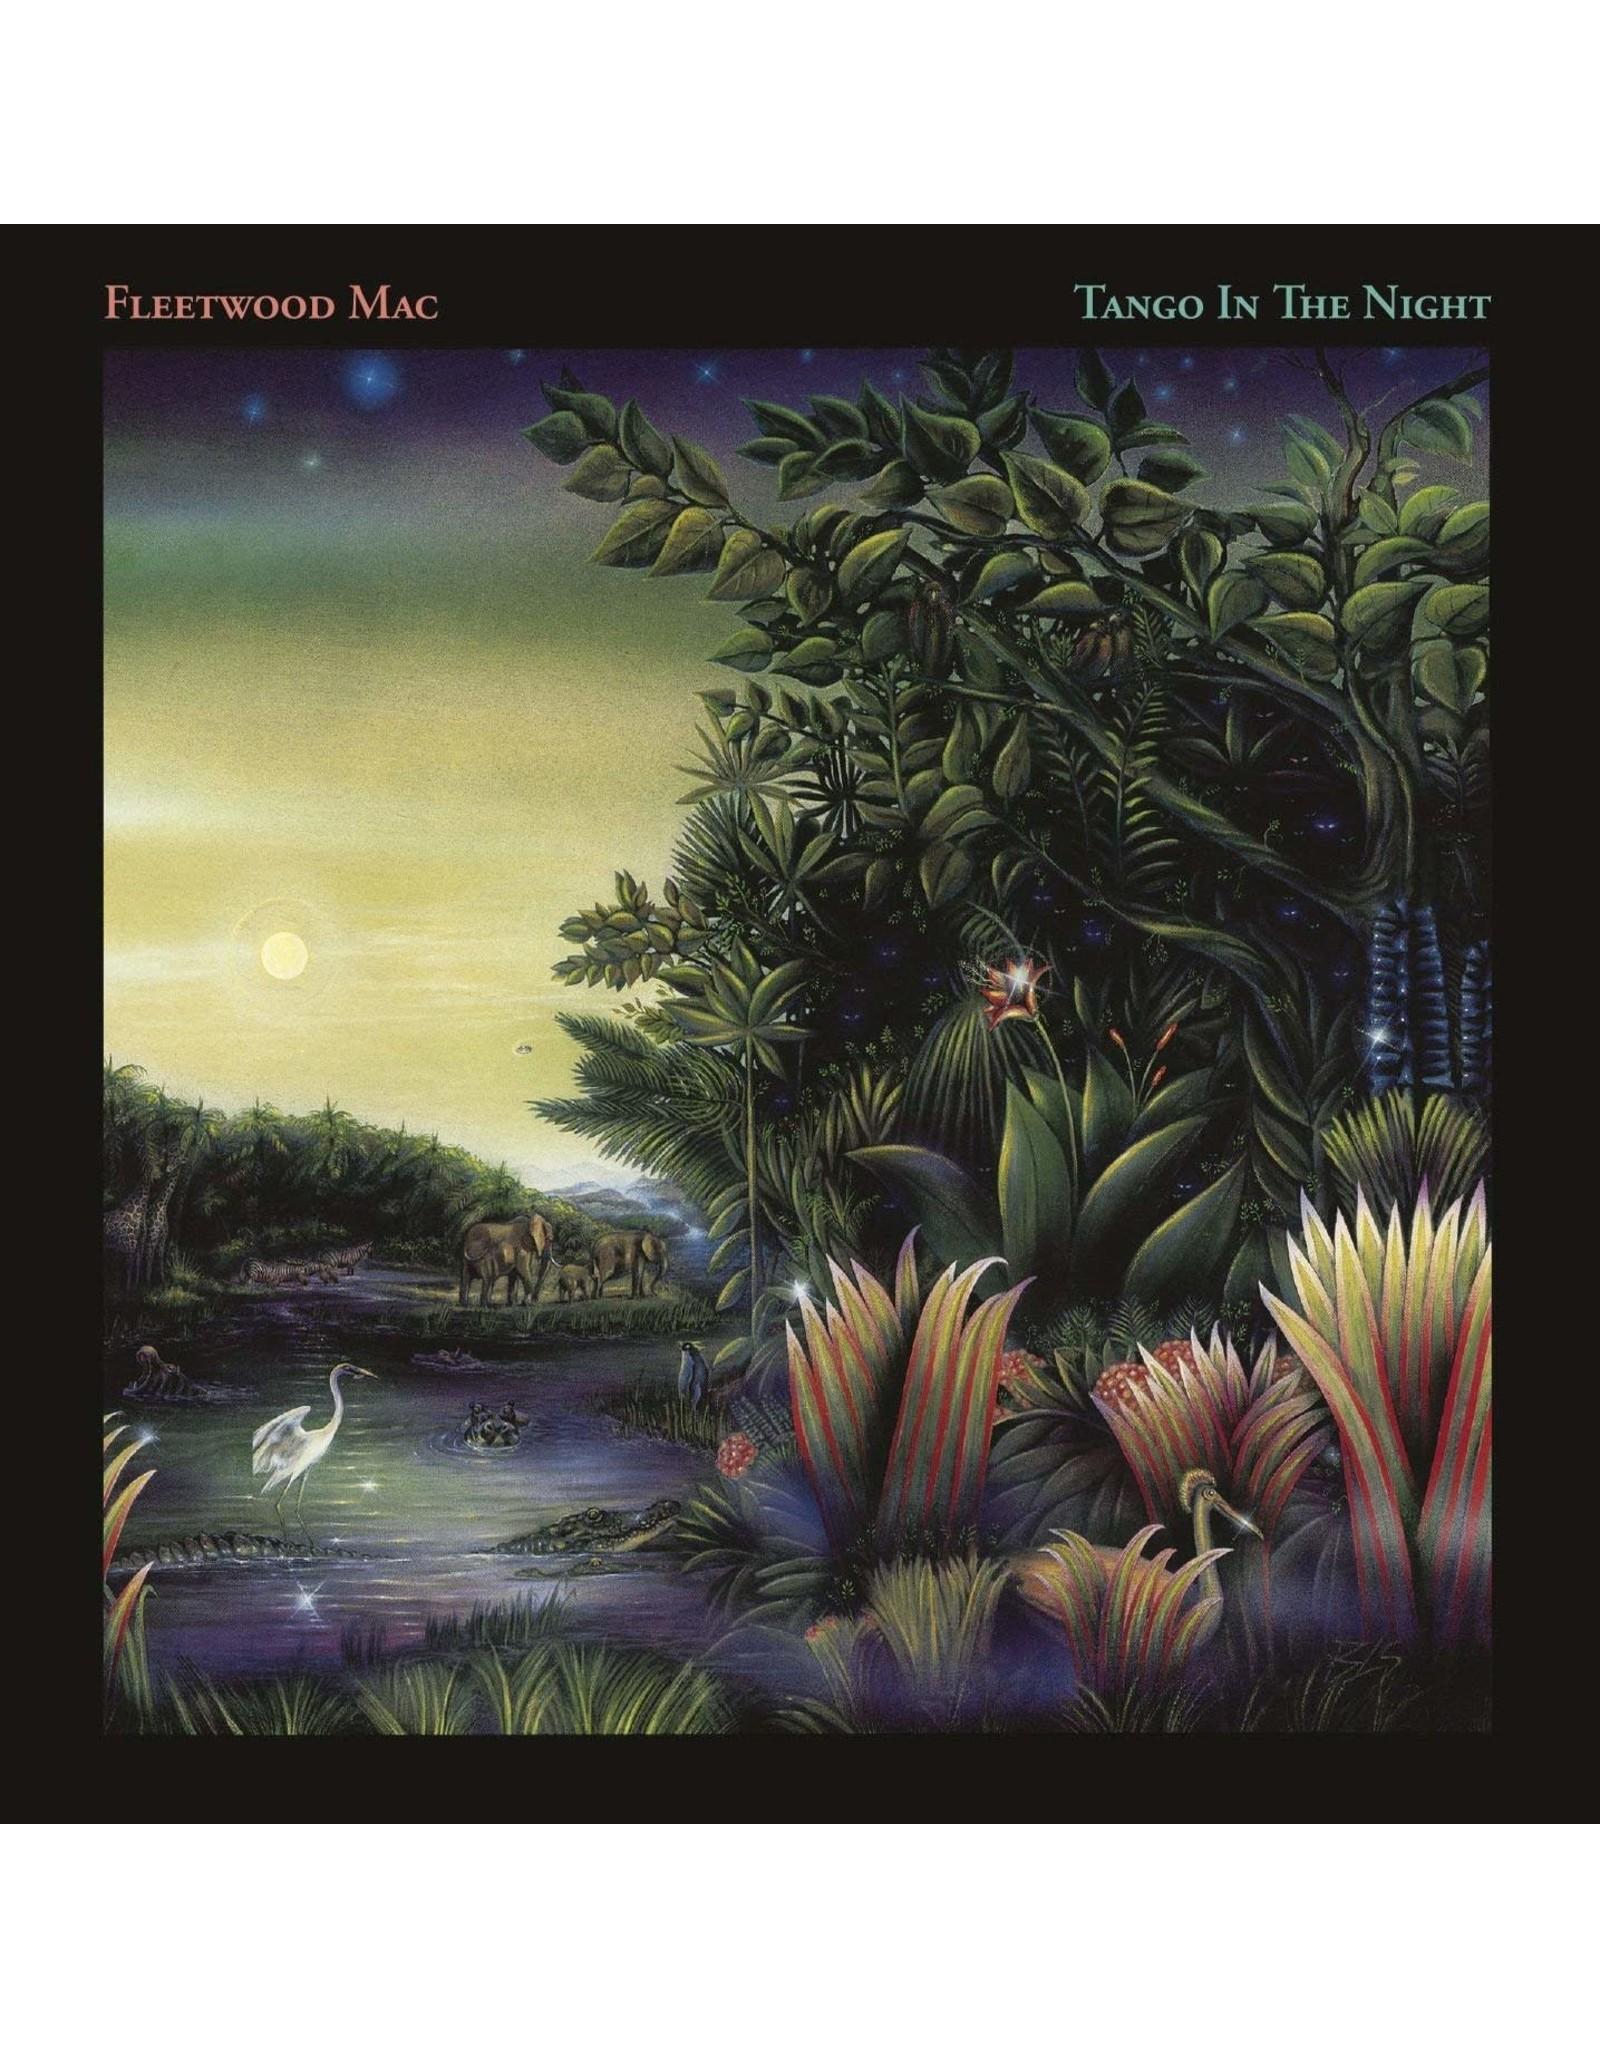 Fleetwood Mac - Tango In The Night (30th Anniversary)